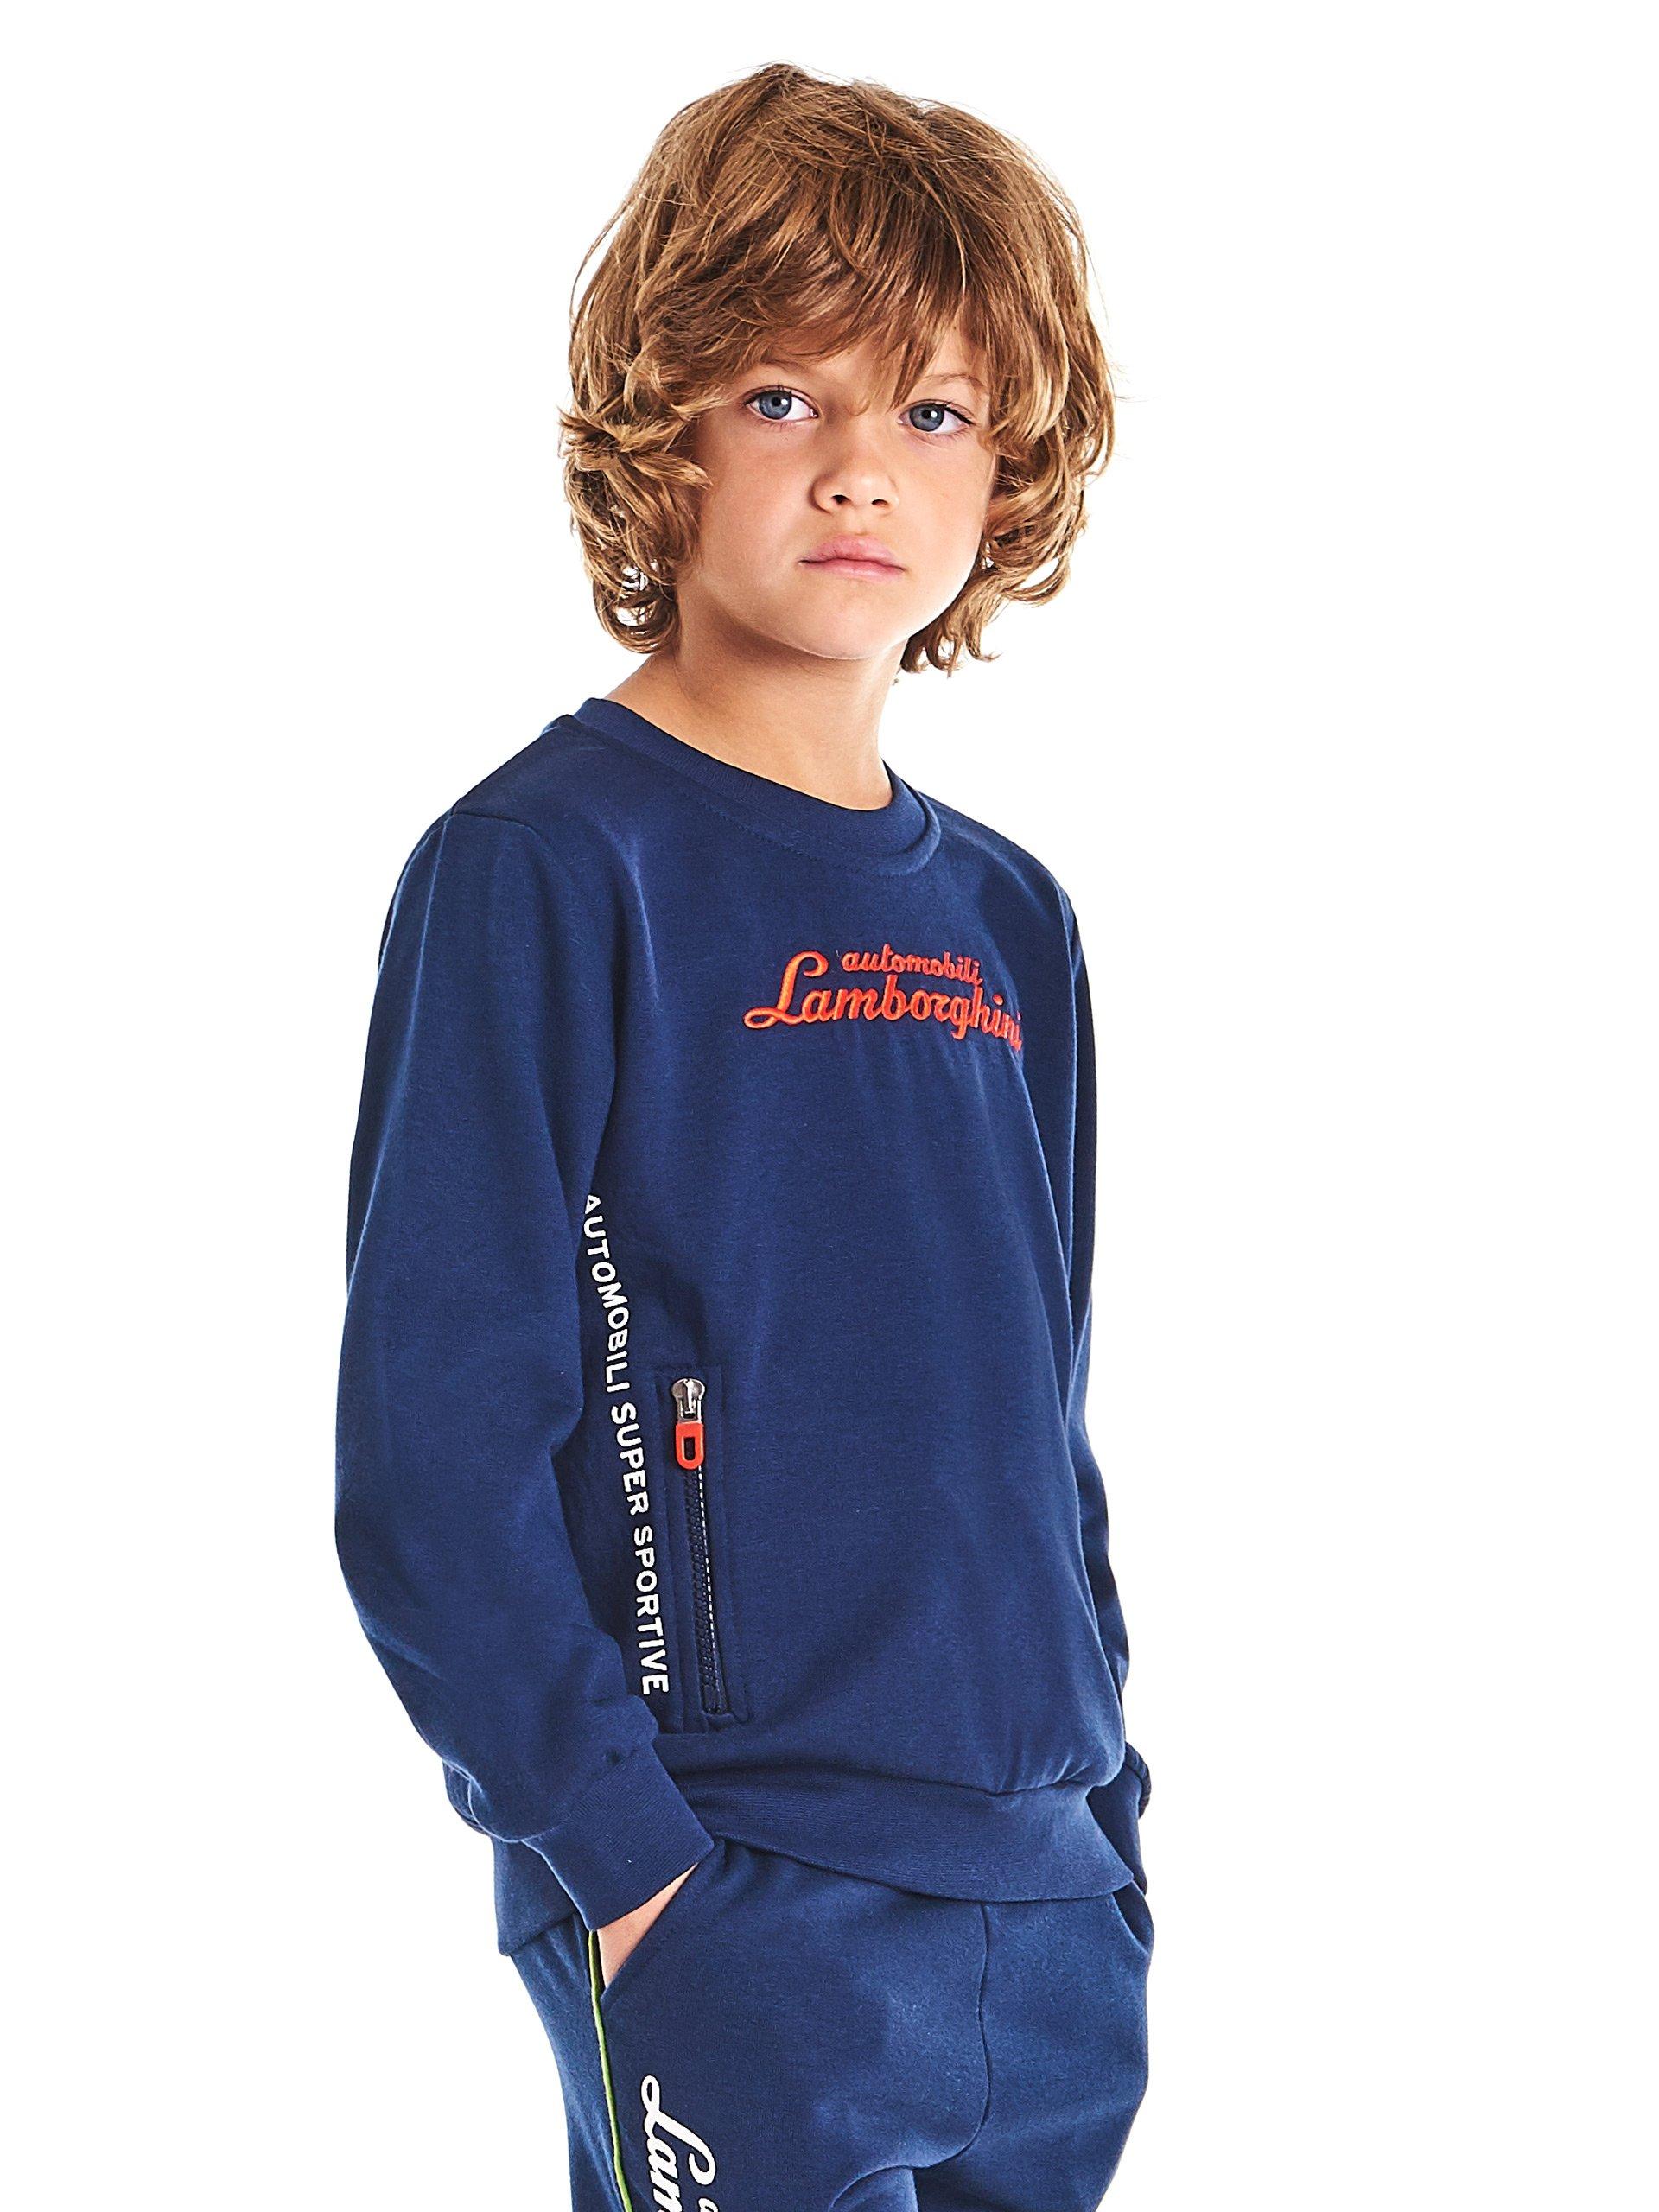 Automobili Lamborghini Children Lamborghini Kids Logoscript Sweatshirt 8 Years Blue